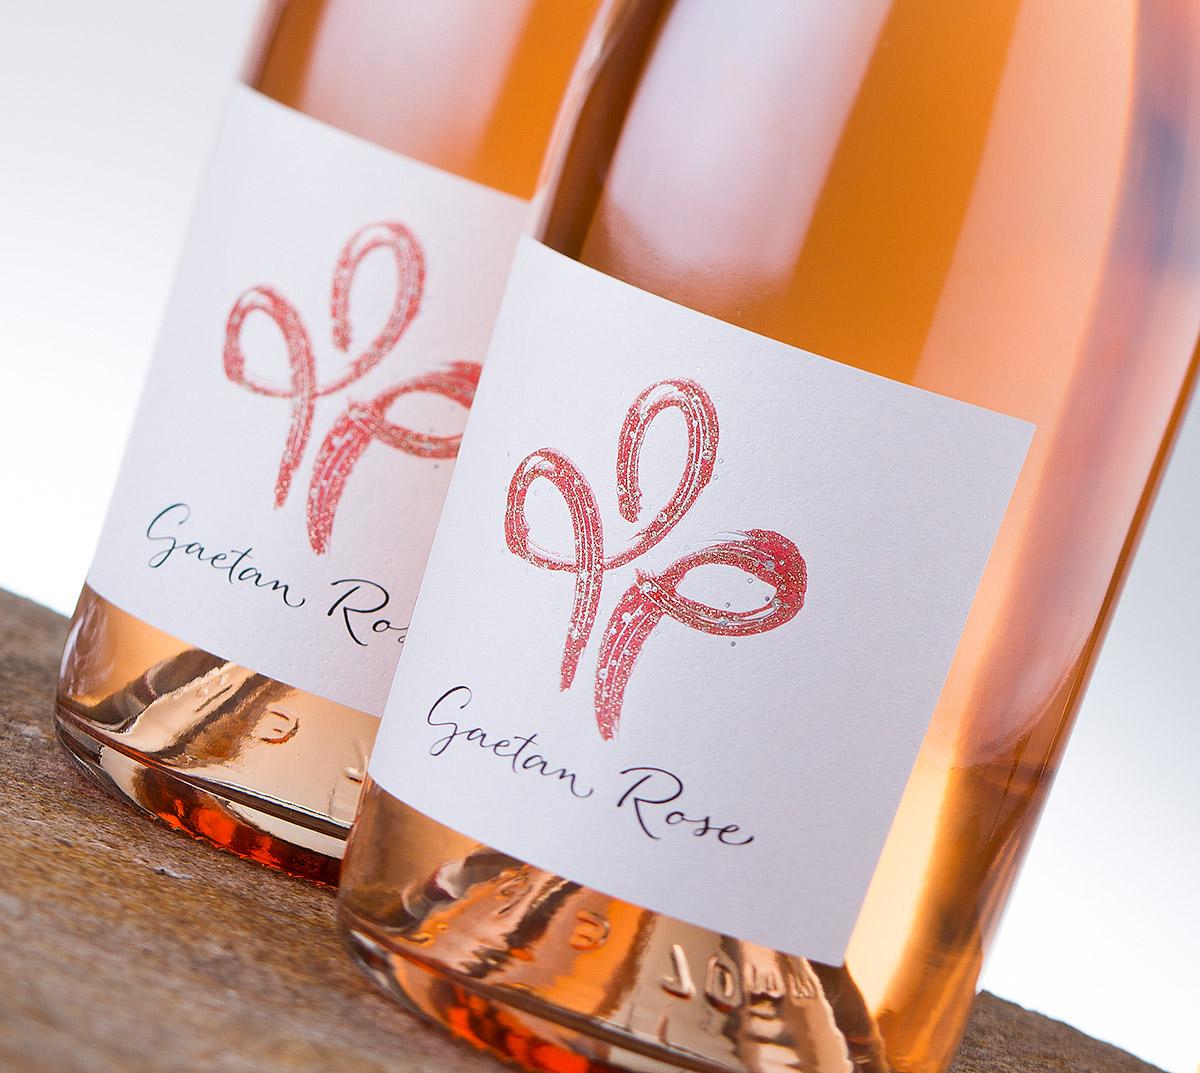 Gaetan Rose wine label